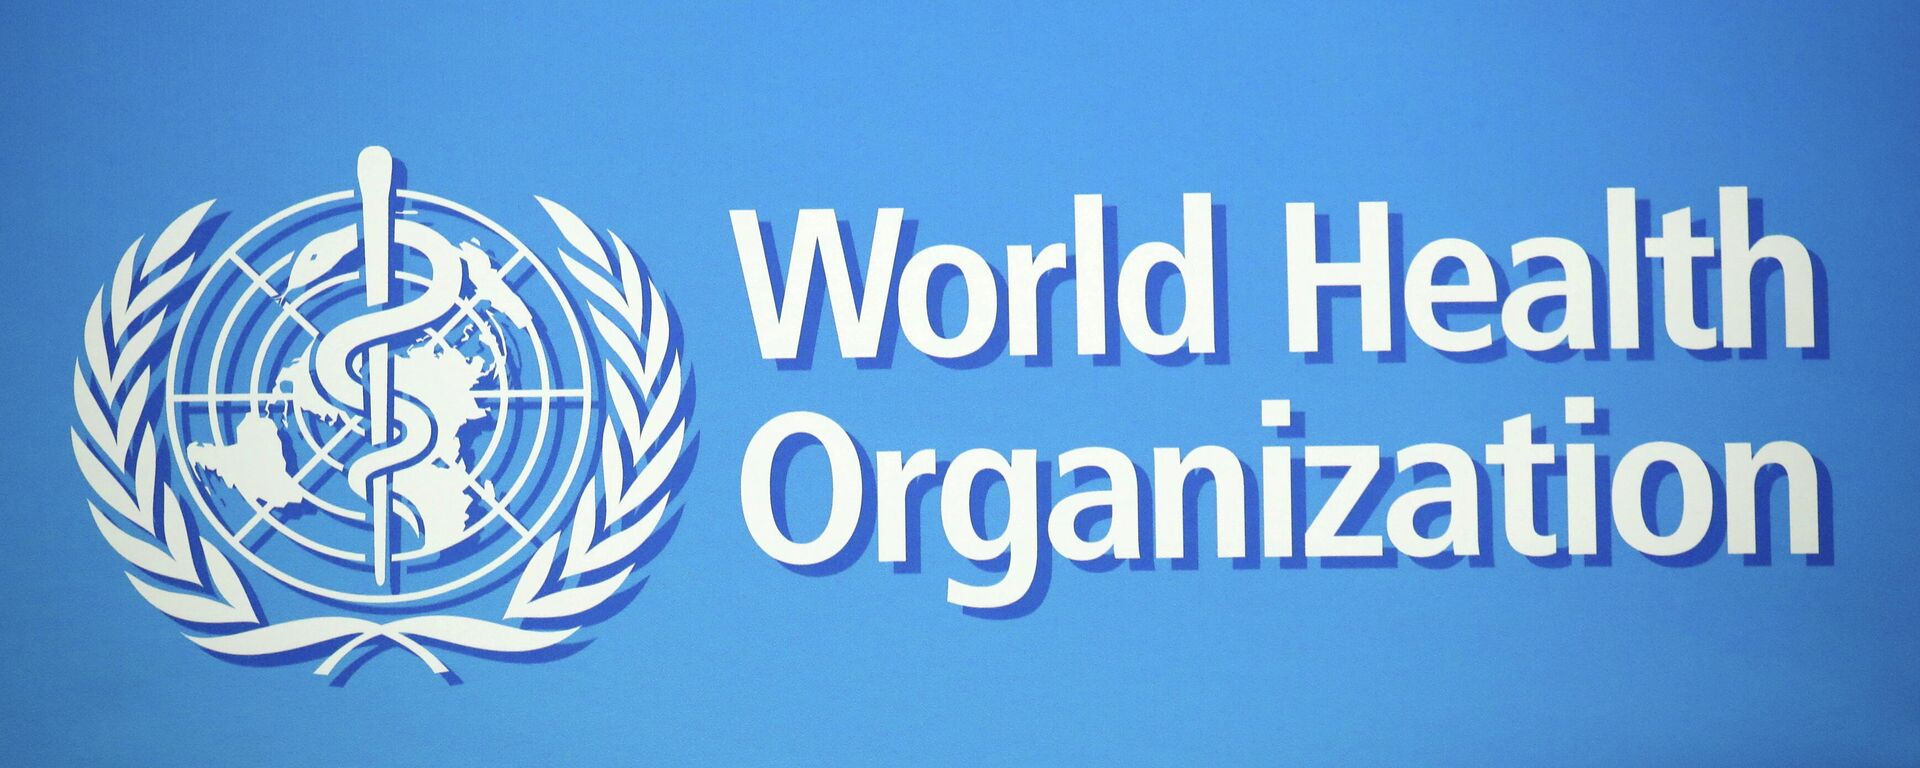 World Health Organization (WHO) - SNA, 1920, 08.07.2021